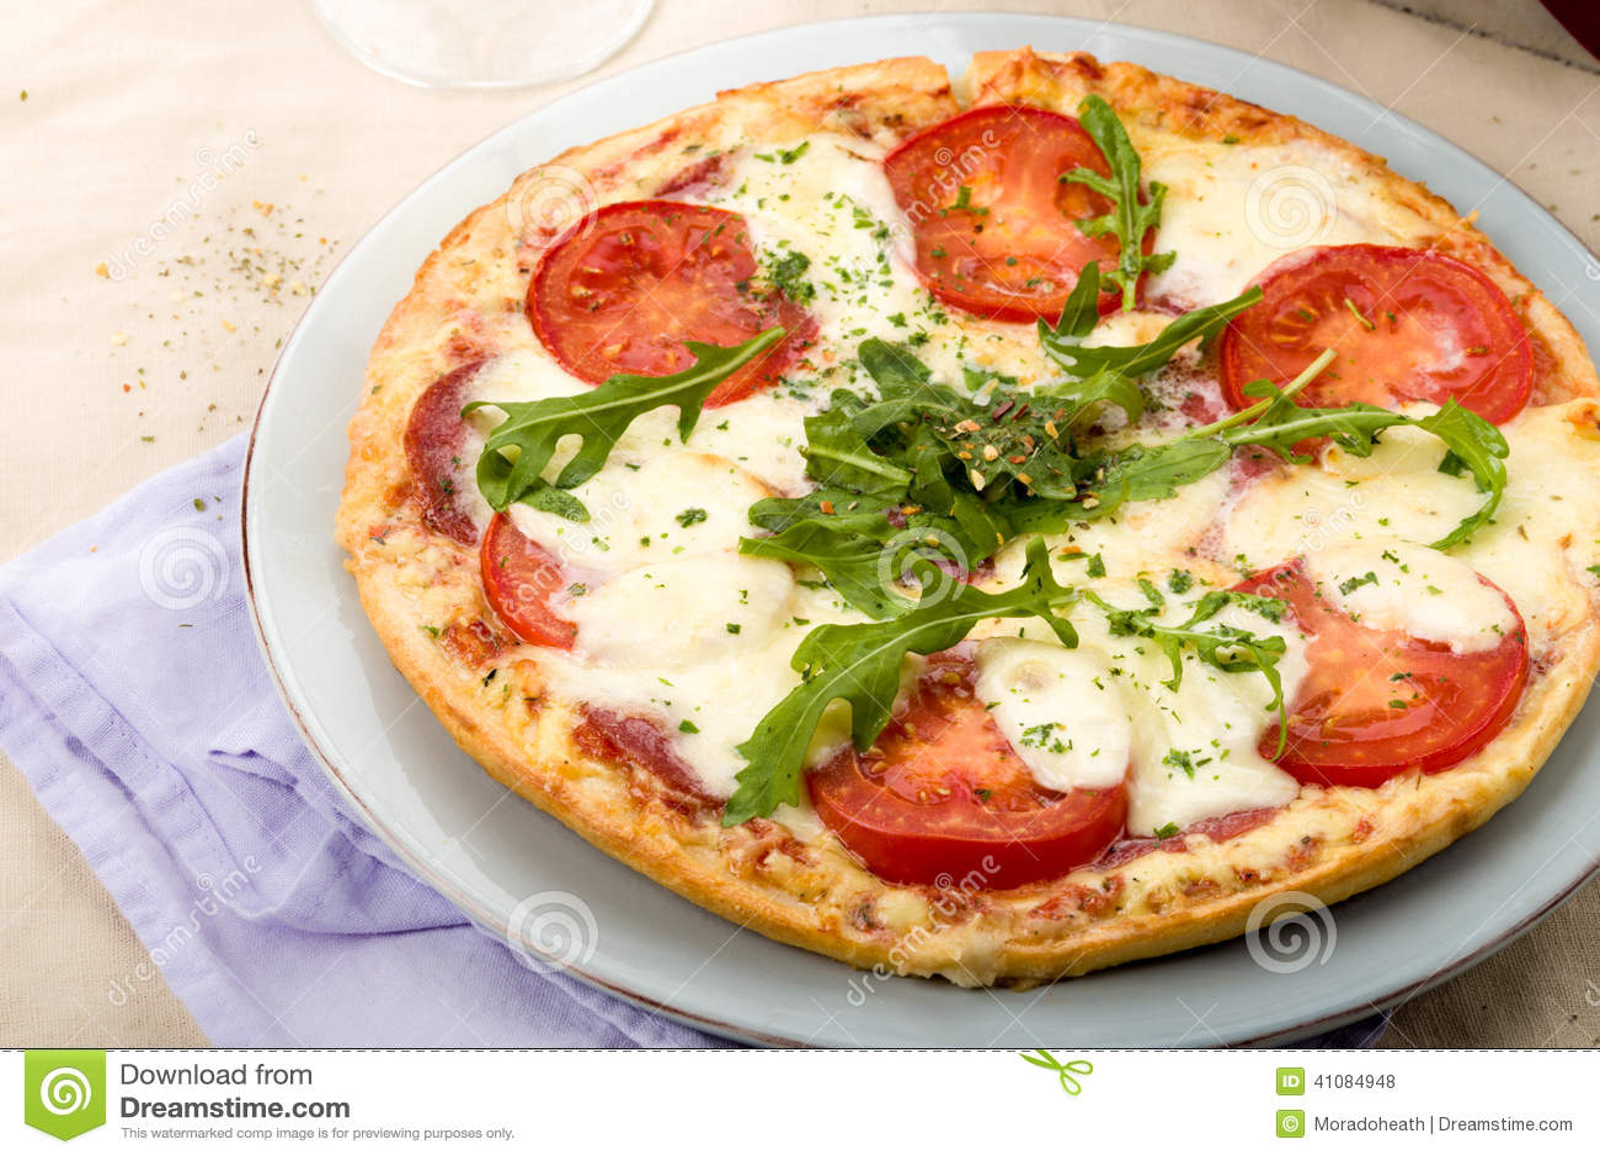 heirloom tomato and basil pizza fresh tomato and basil pizza ...